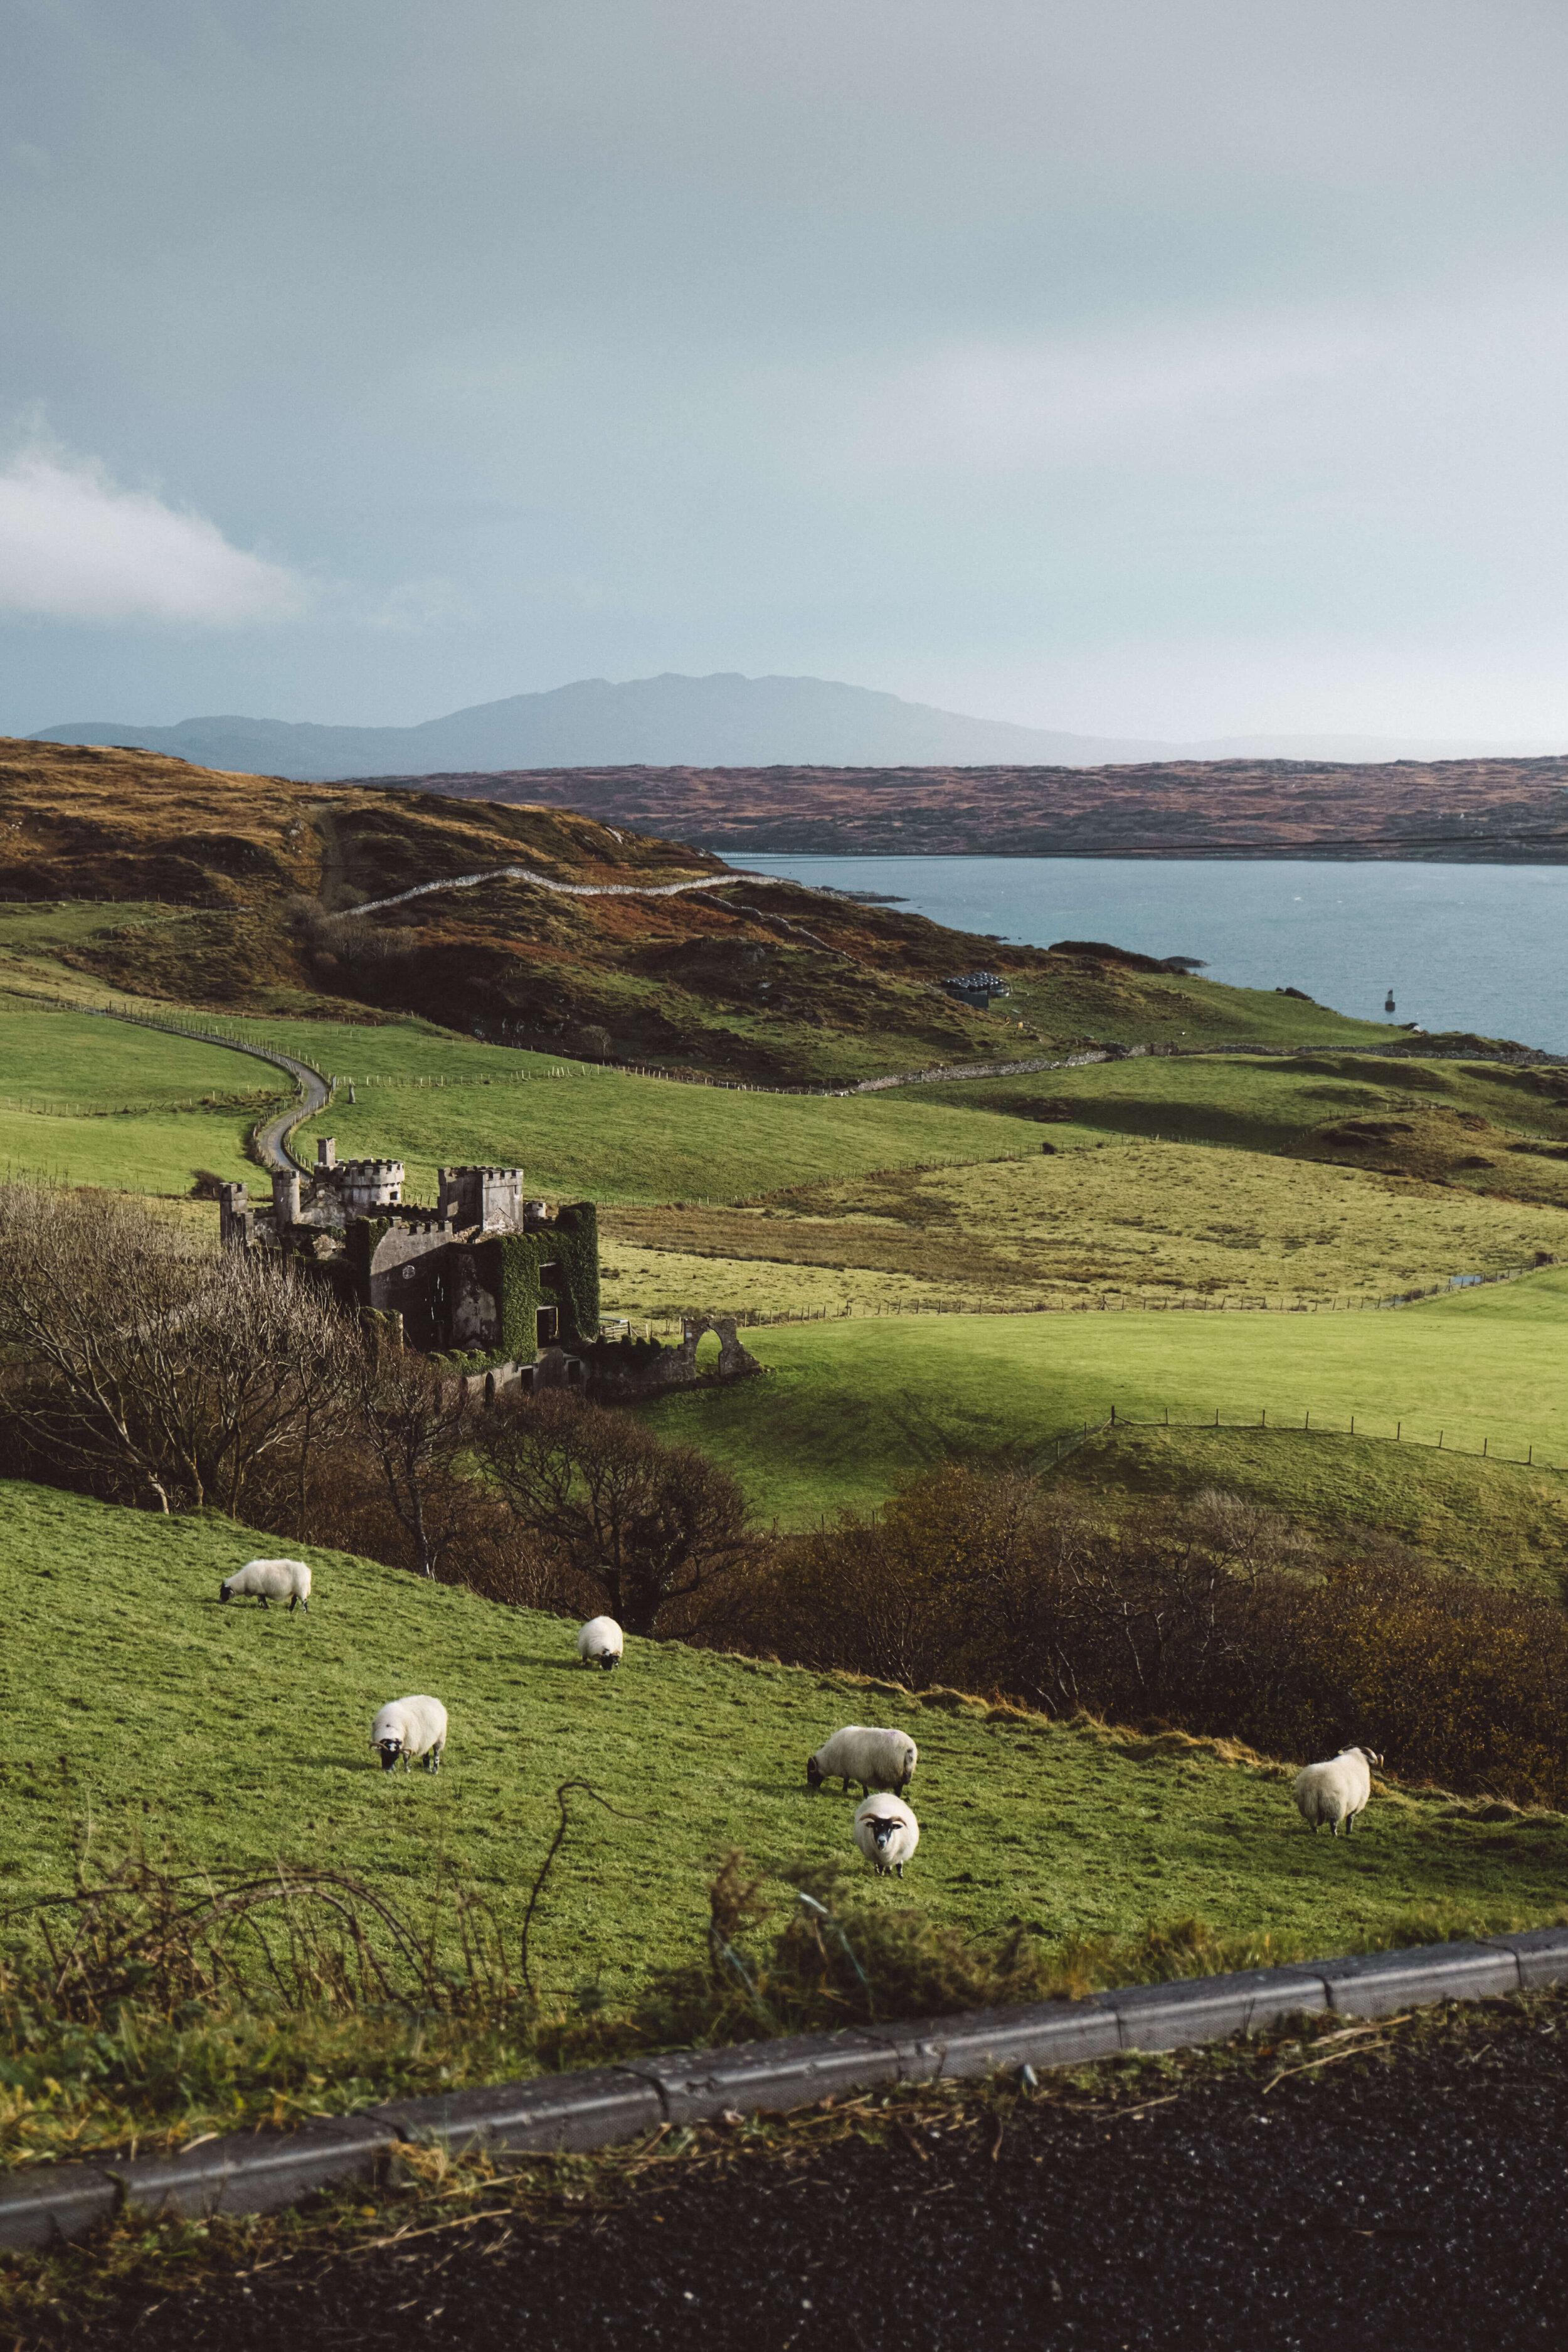 Que Faire En Irlande : faire, irlande, Faire, Irlande, Visiter, Connemara, Hors-Pistes